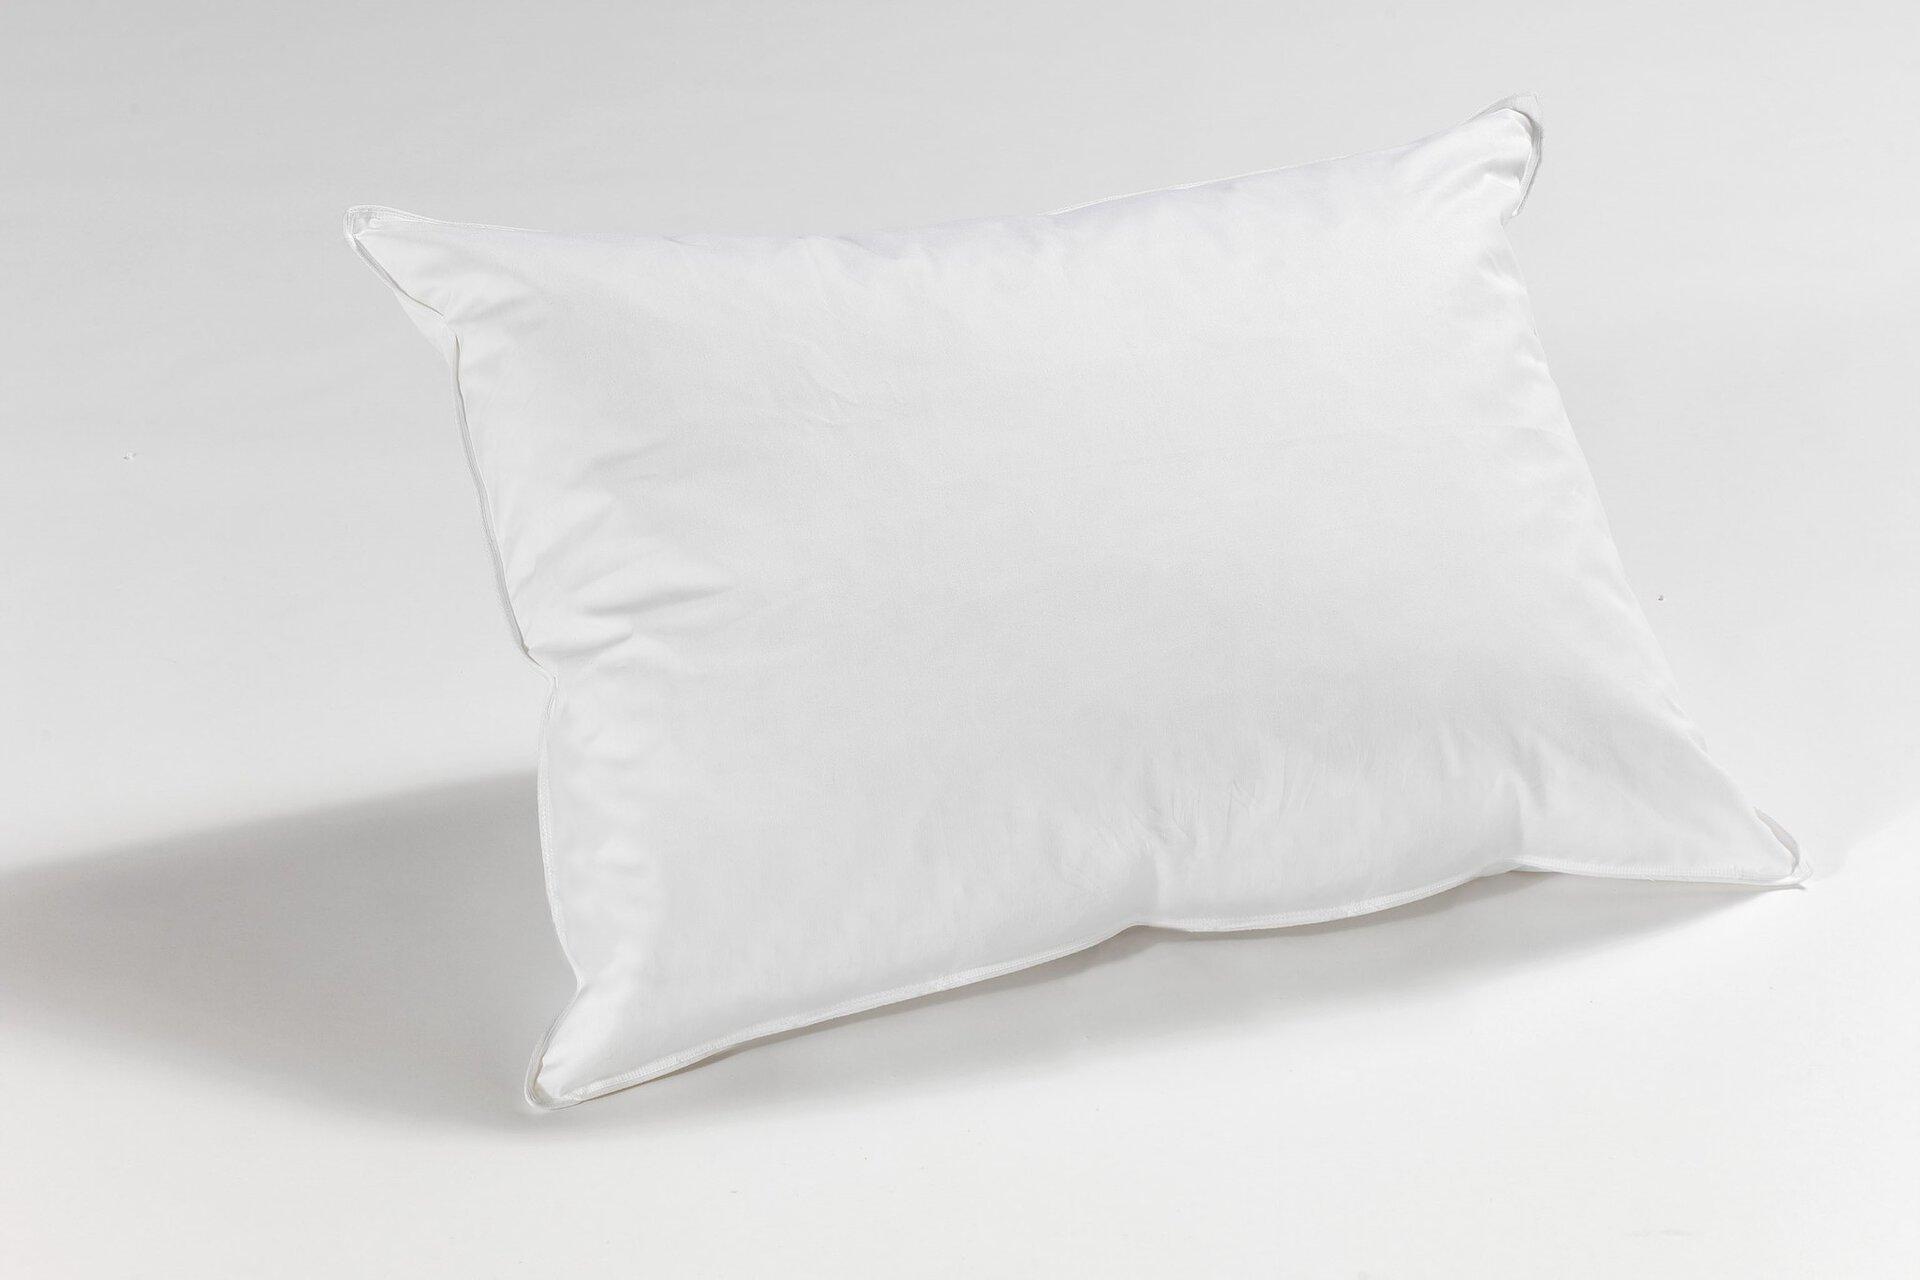 Füllkissen Sanders Textil 40 x 60 cm